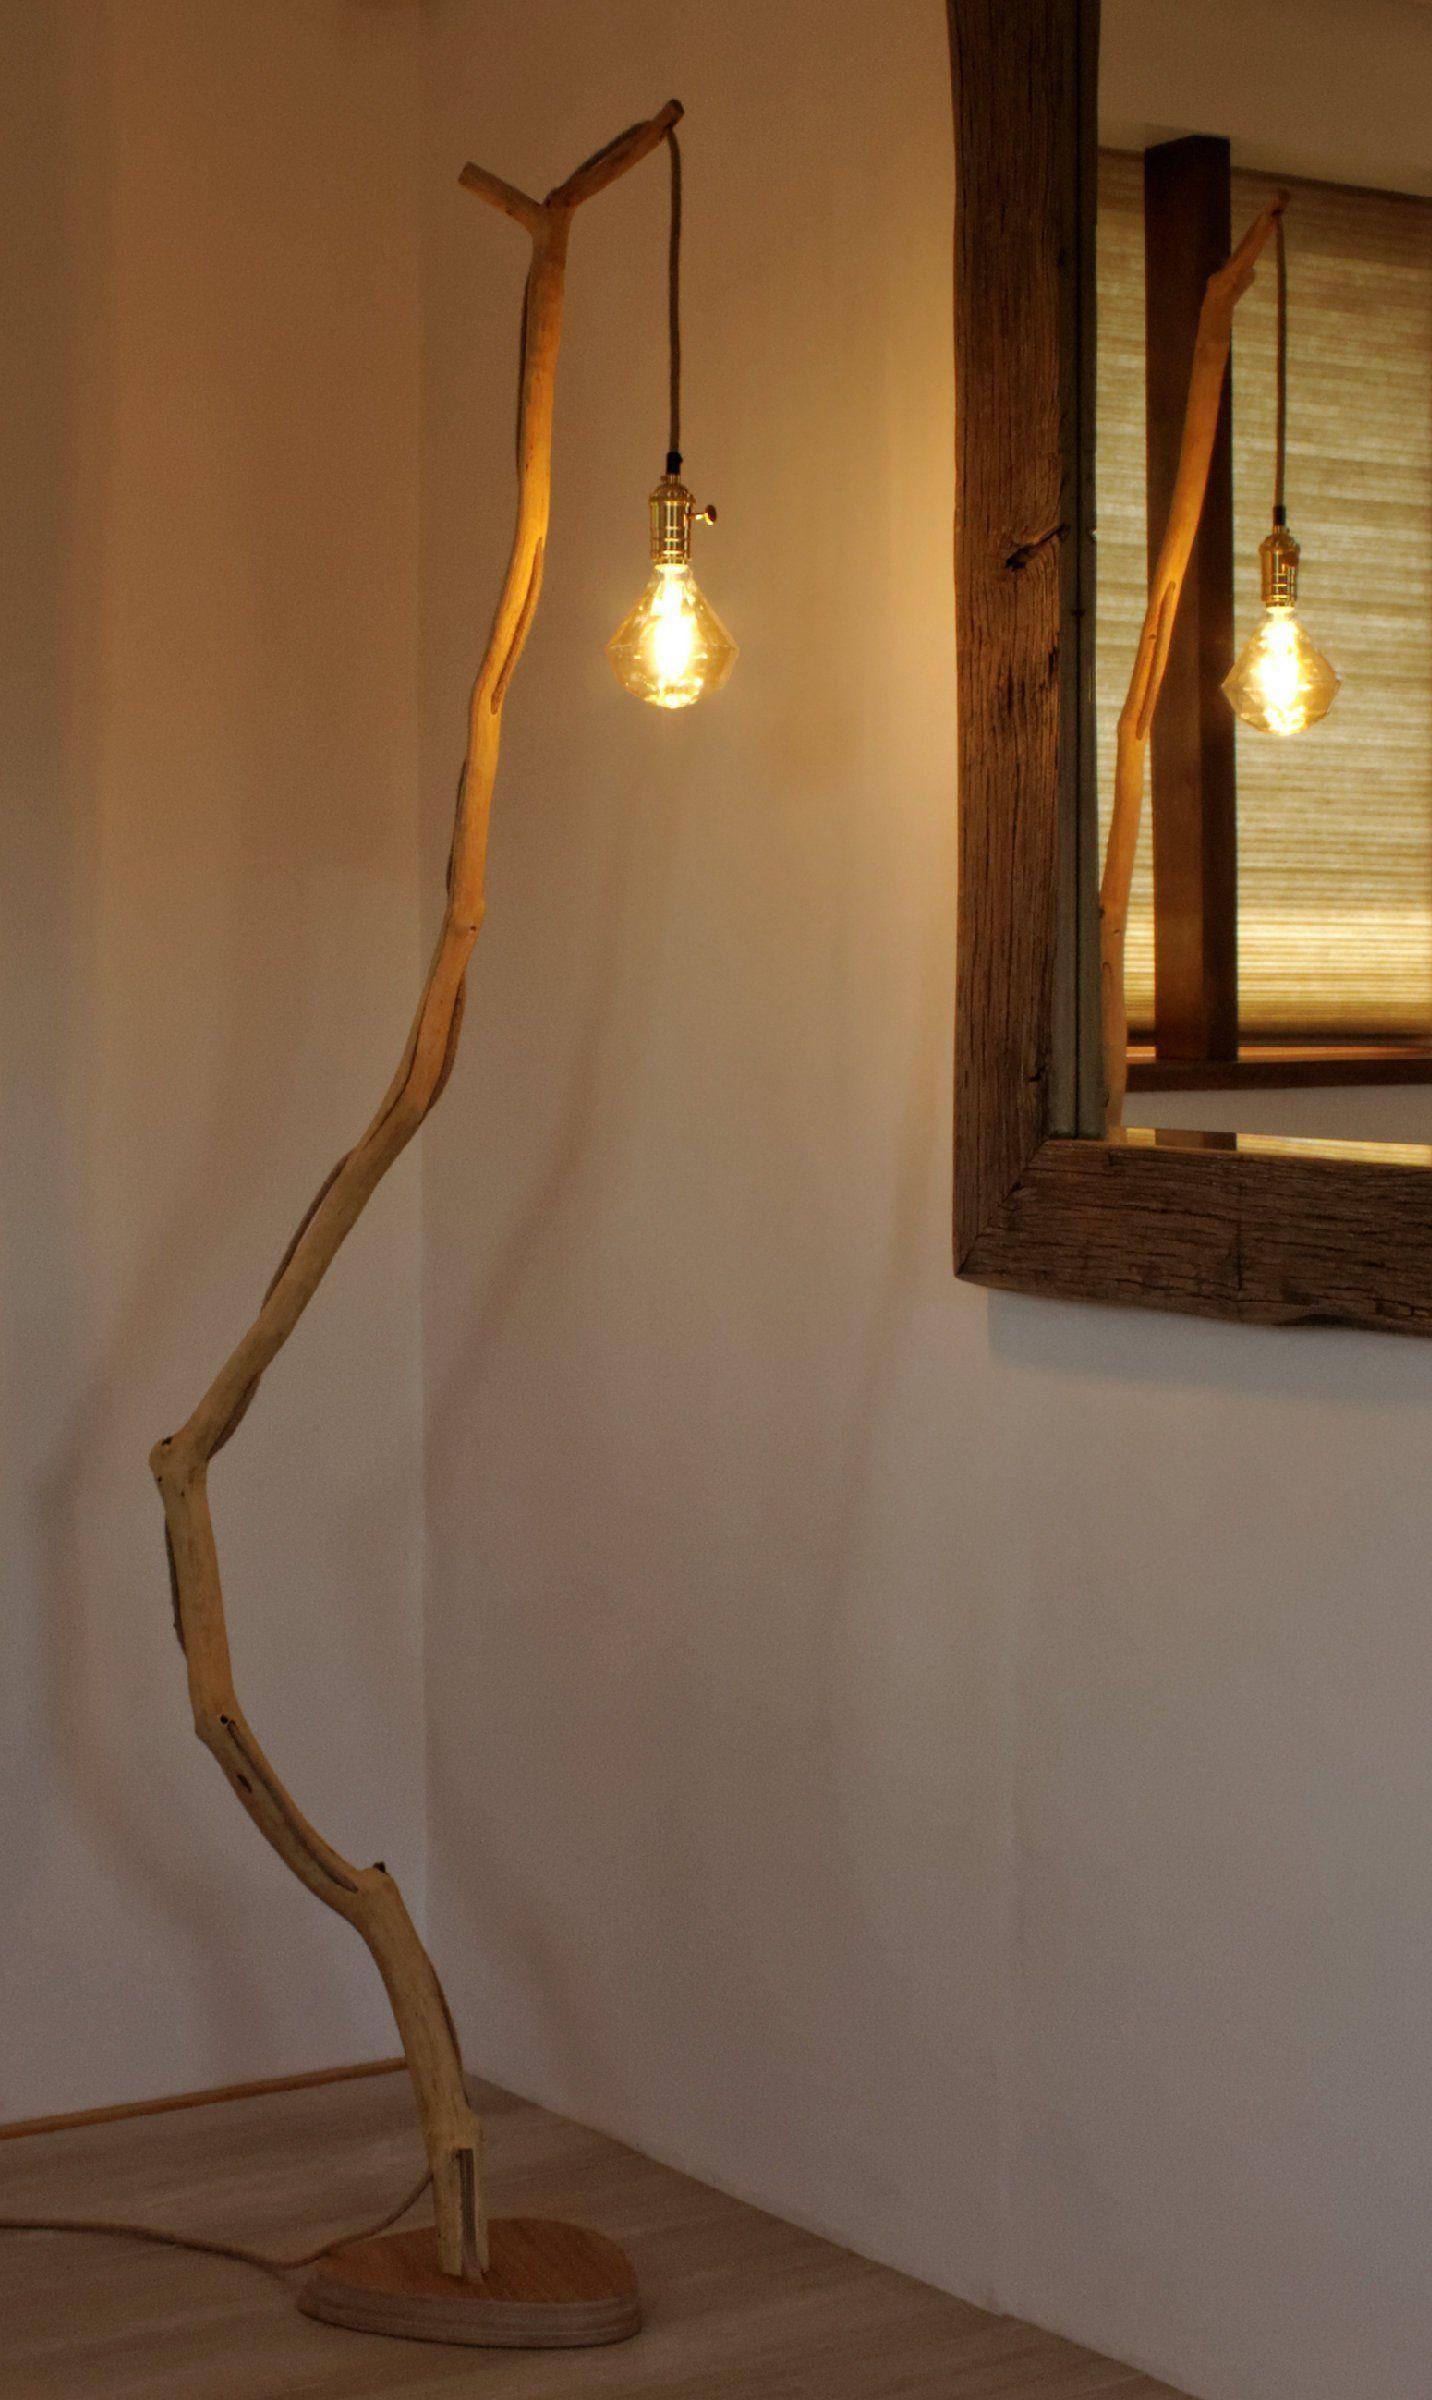 Lampa Podlogowa Lampa Ze Starej Galezi Debowej Lampa Etsy Wood Lamps Diy Floor Lamp Unique Floor Lamps